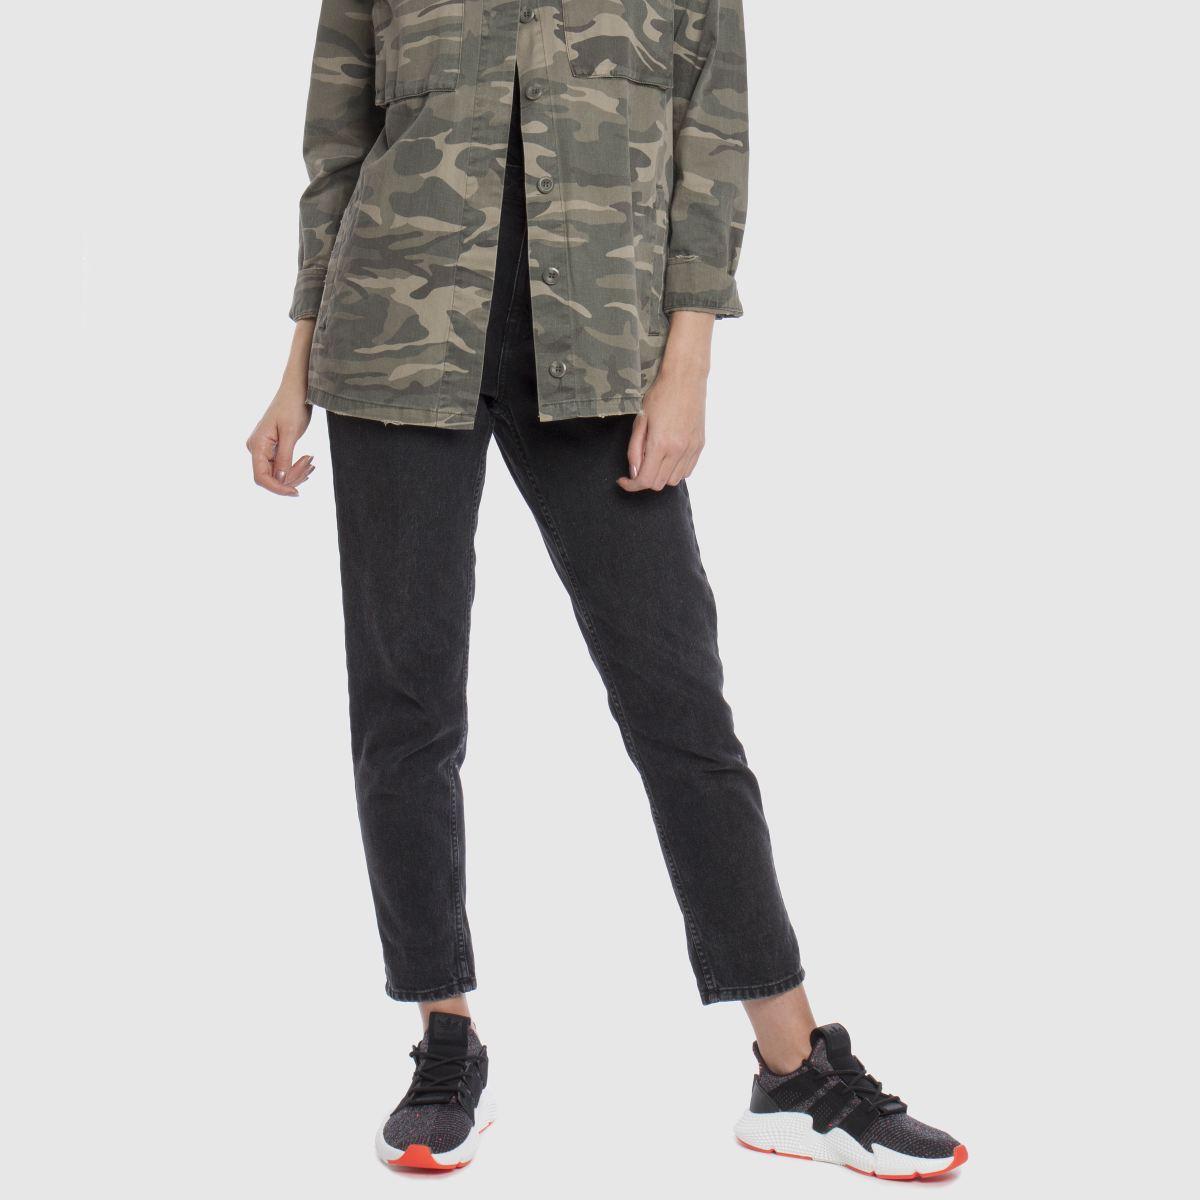 Damen Schwarz-rot adidas Prophere Sneaker   schuh Gute Qualität beliebte Schuhe